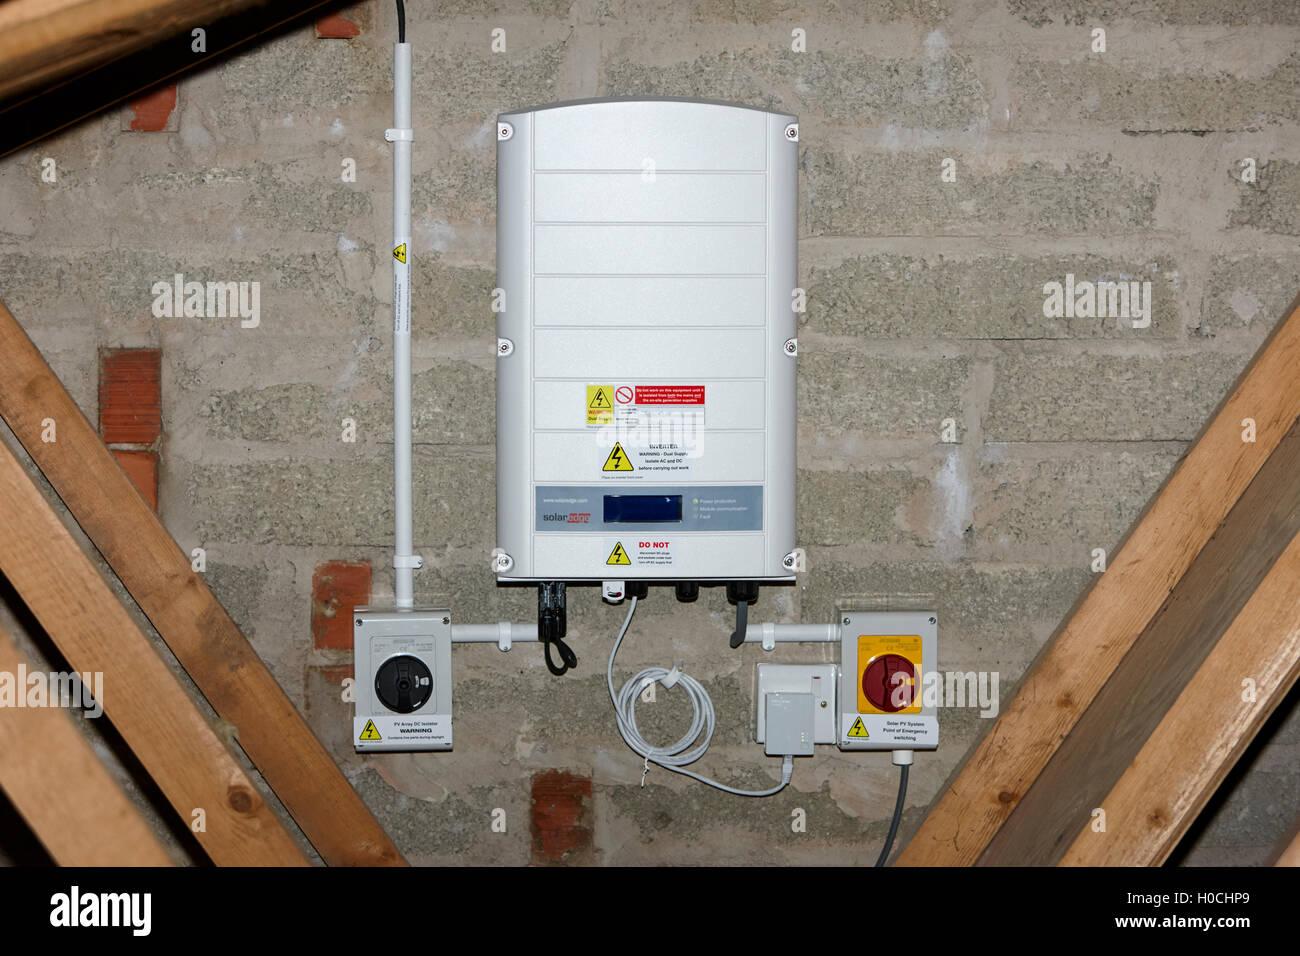 solar pv wiring diagram uk database model visio 2010 solaredge inverter in a domestic panel installation